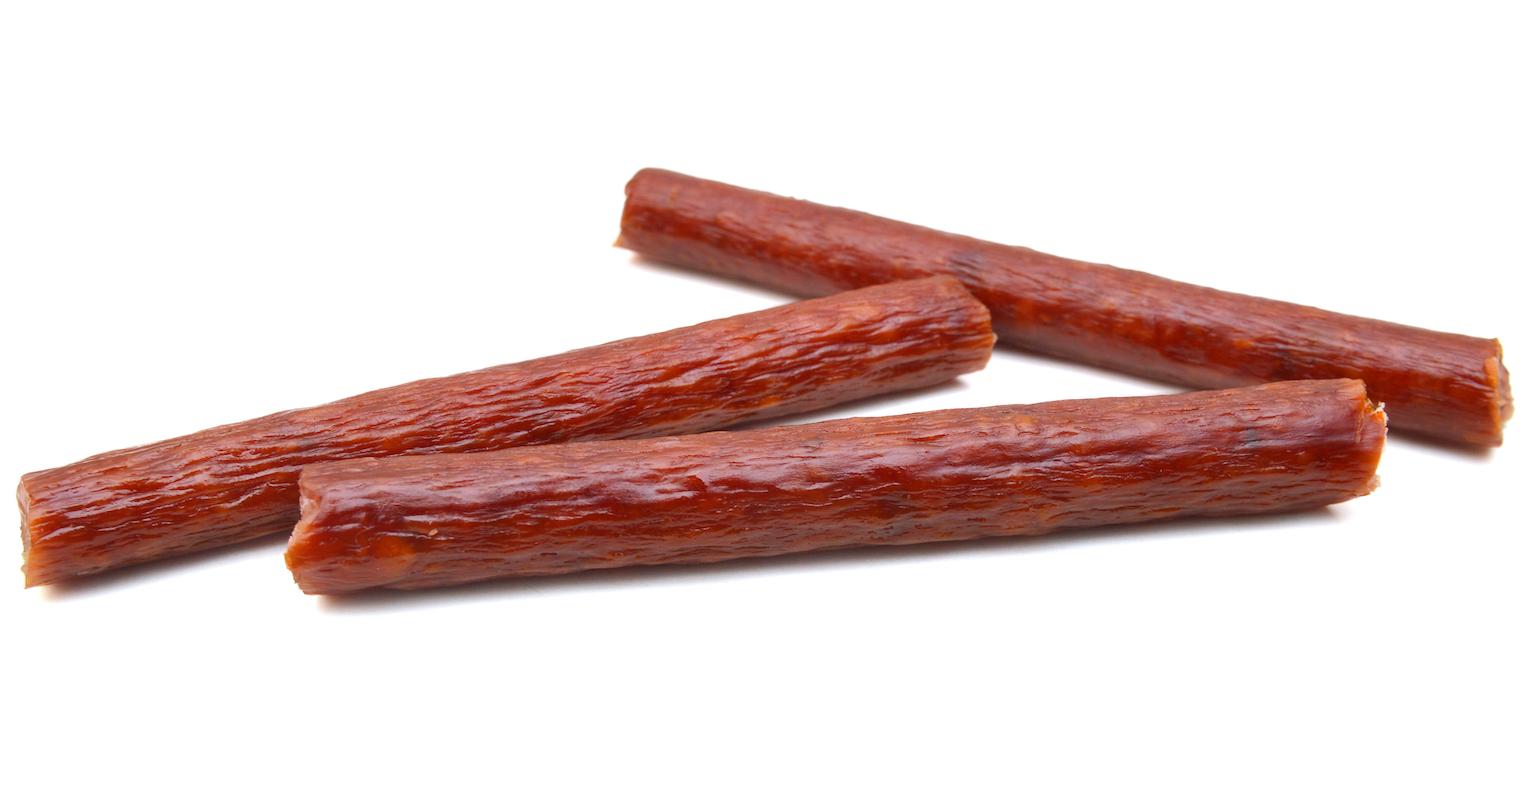 Smoked thin pork meat stick snack